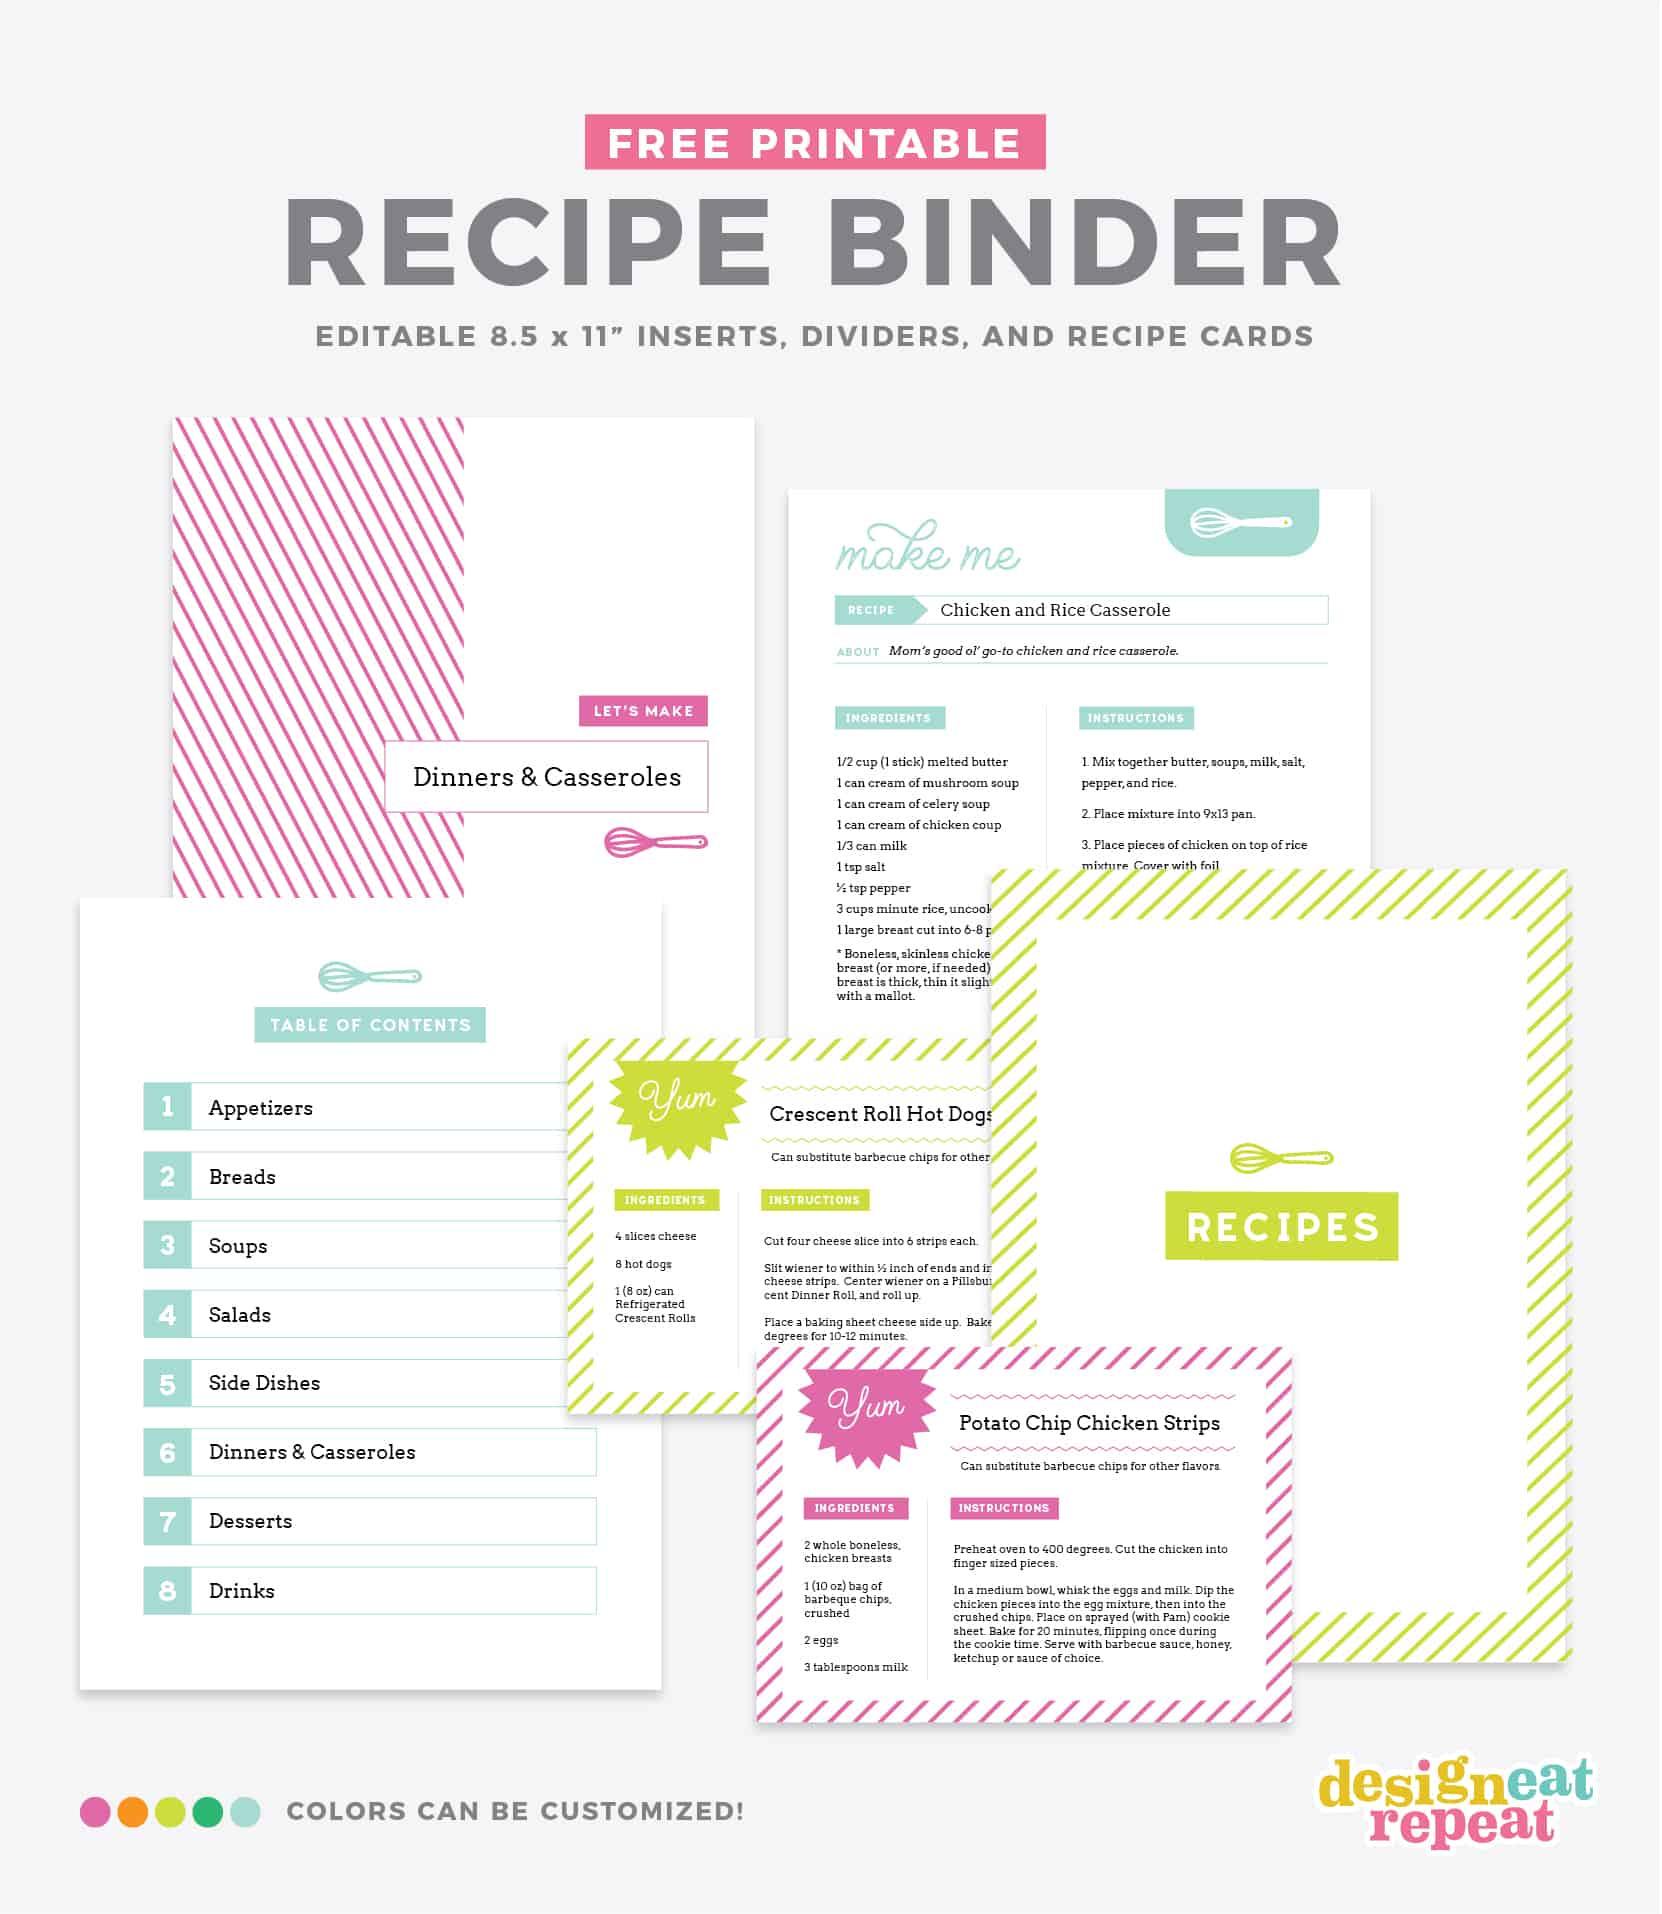 Diy Recipe Book (With Free Printable Recipe Binder Kit!) - Free Printable Recipes